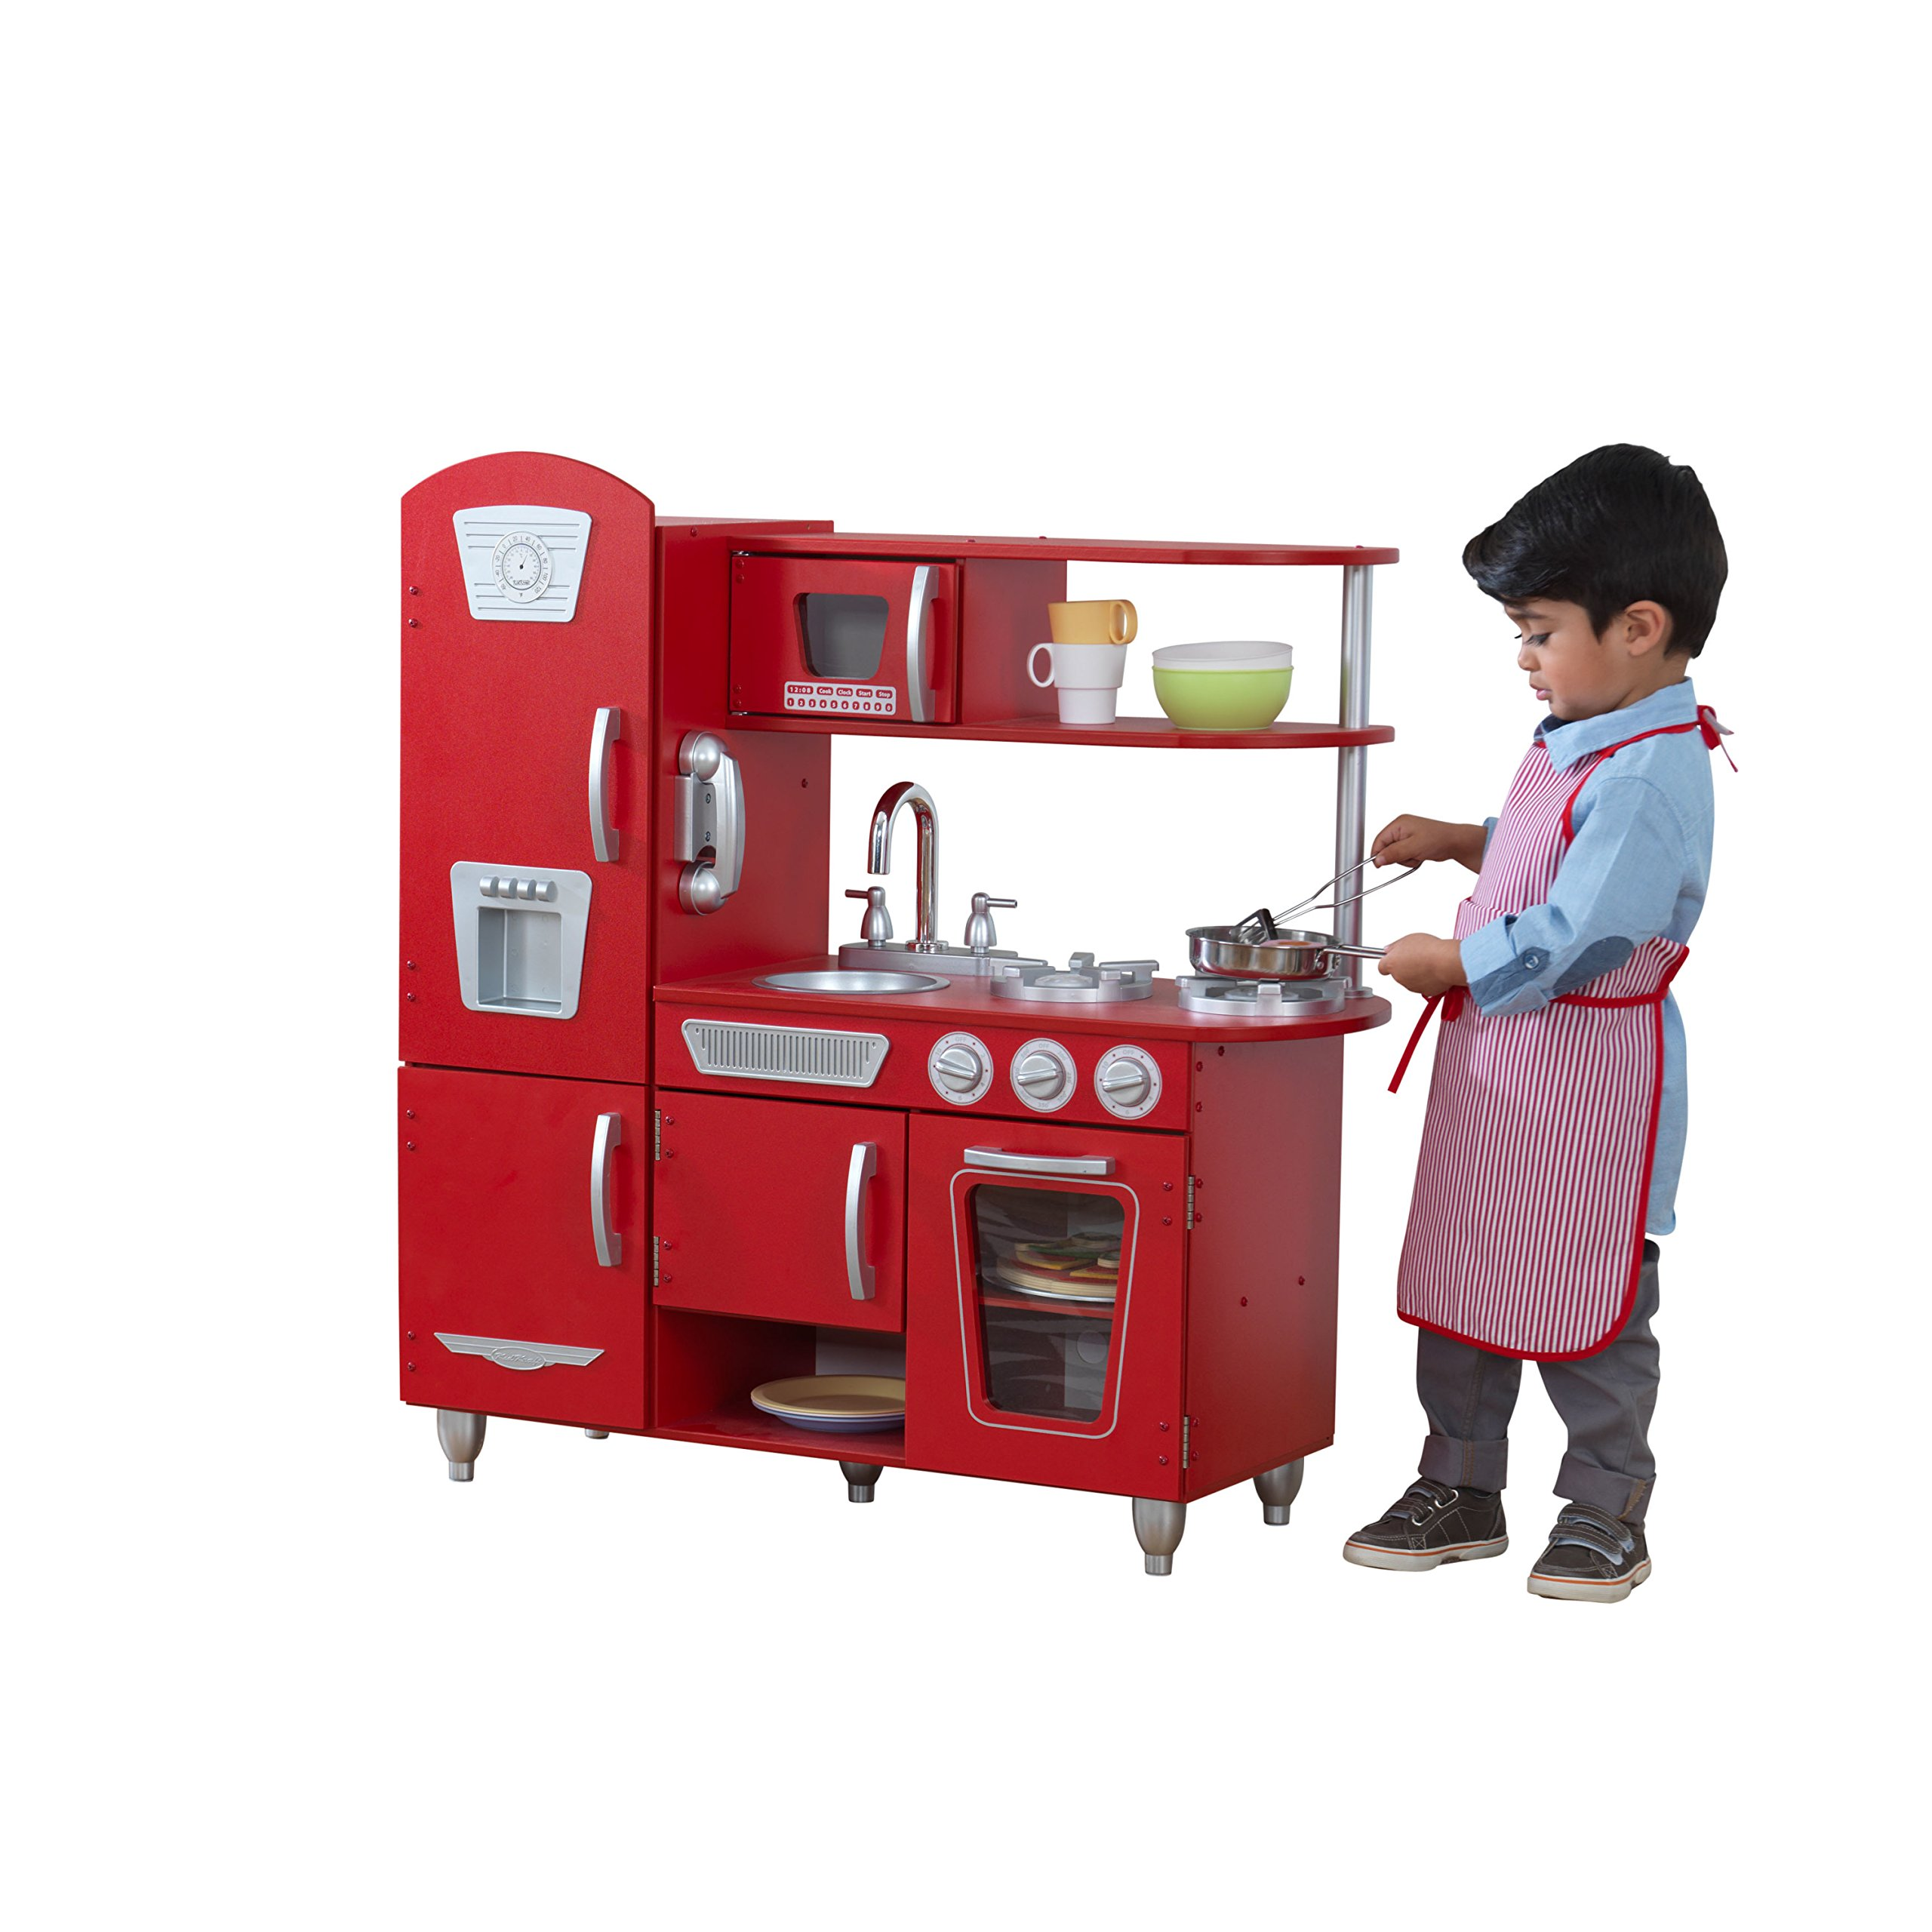 KidKraft Vintage Play Kitchen - Red by KidKraft (Image #3)